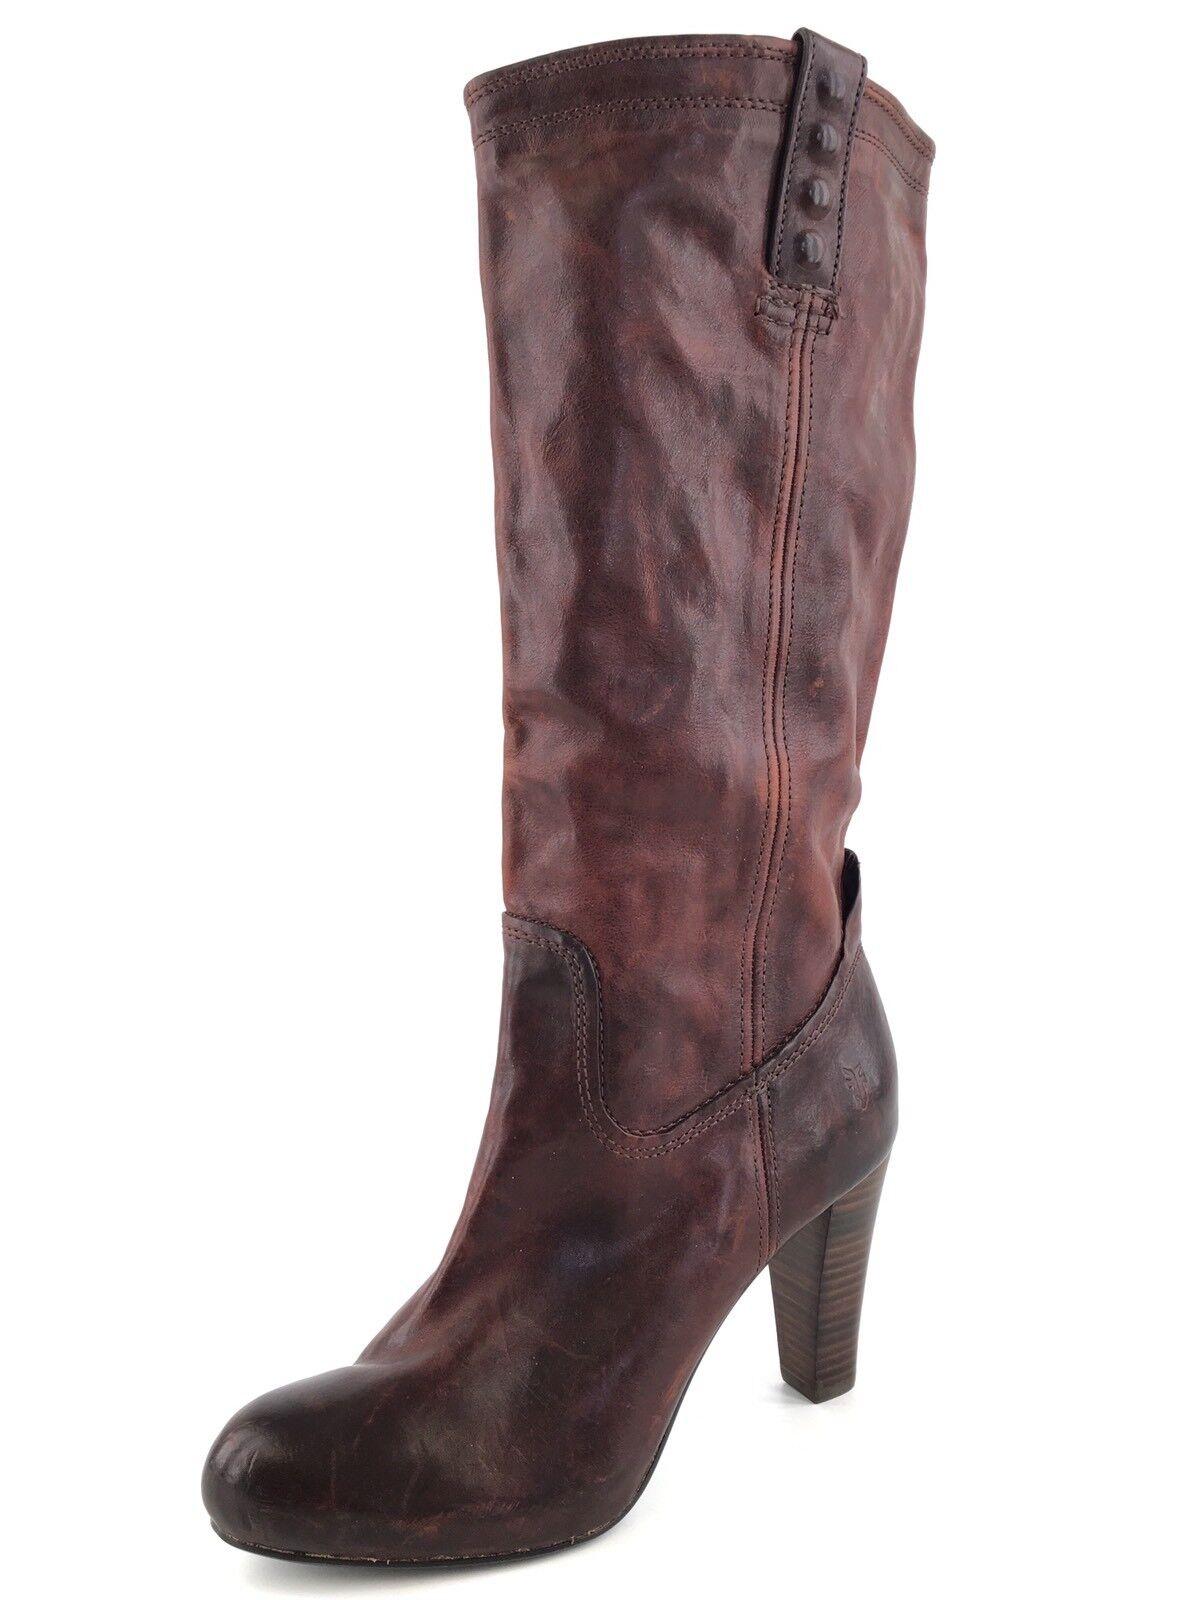 New FRYE 9392 Miranda Stud Tall Redwood Brown Leather Boots Women's Size 9 M*